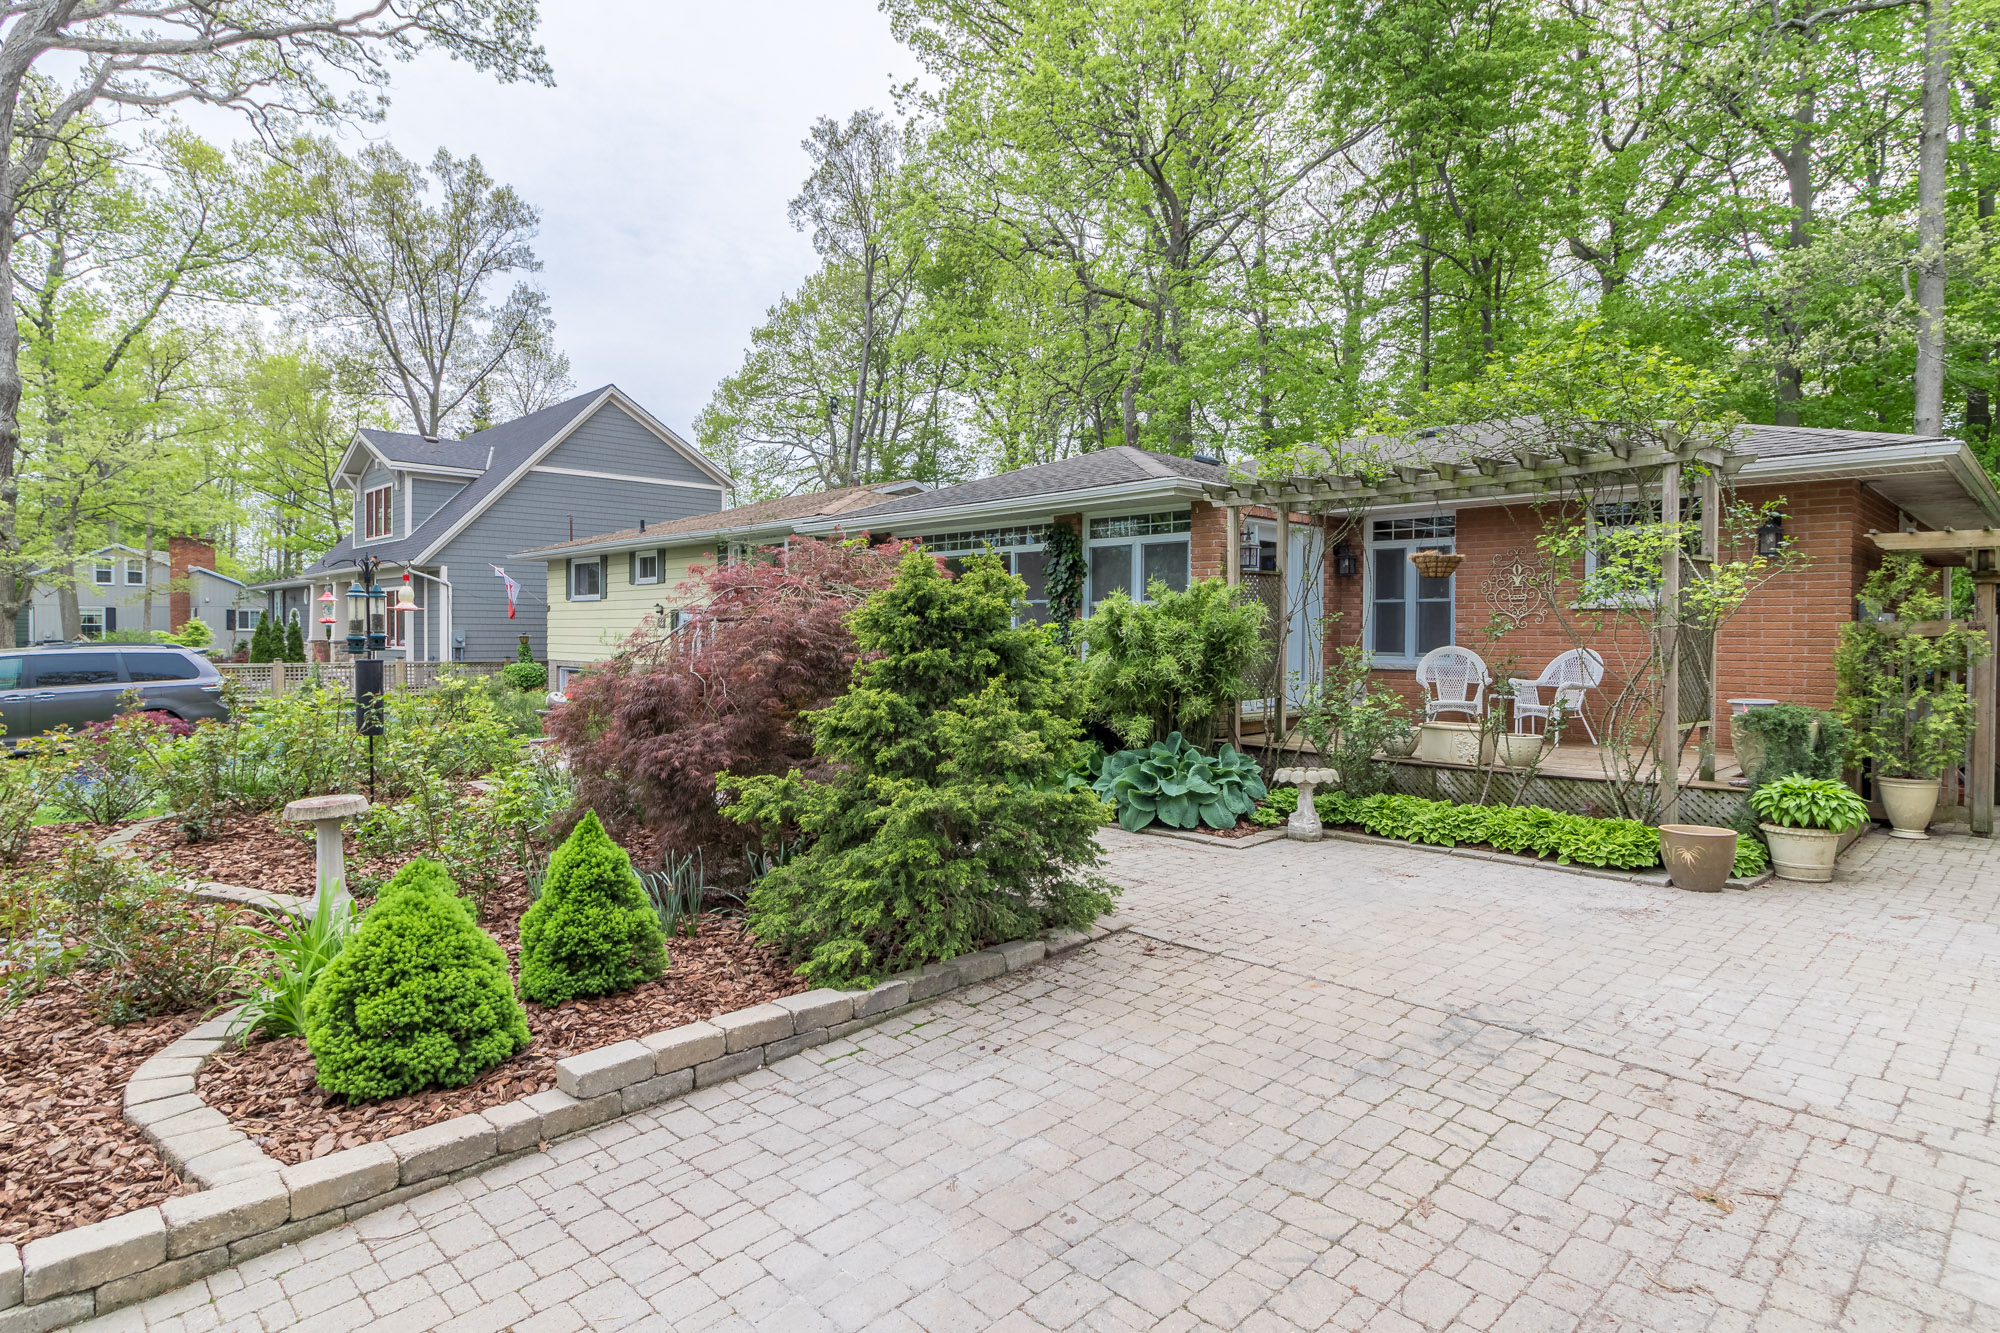 Property image for 40 Shakespeare Avenue – Niagara-on-the-Lake